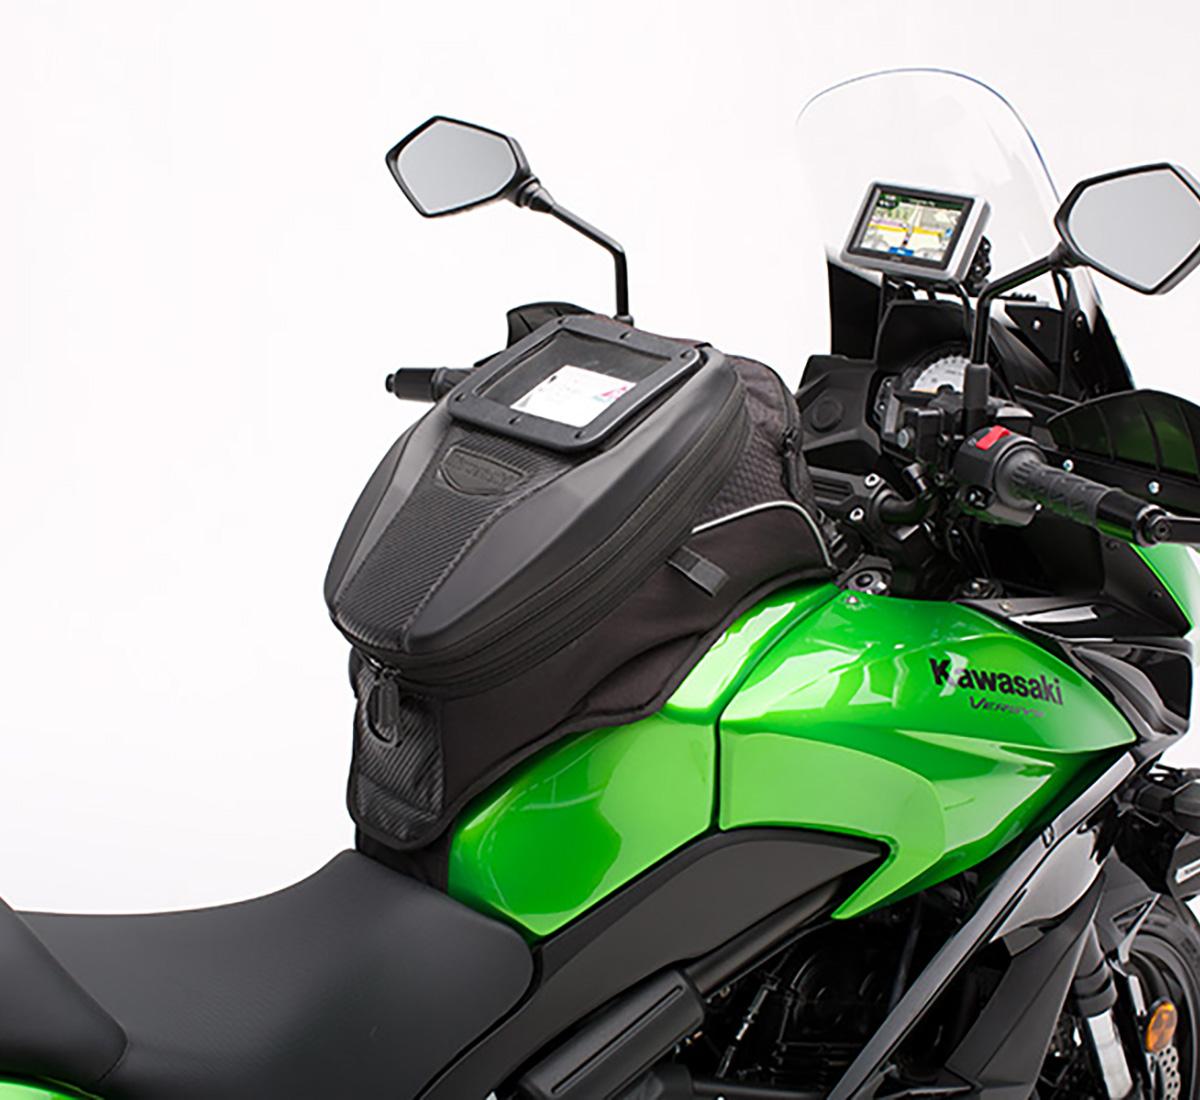 404 2017 versys� 650 lt touring motorcycle by kawasaki  at mifinder.co